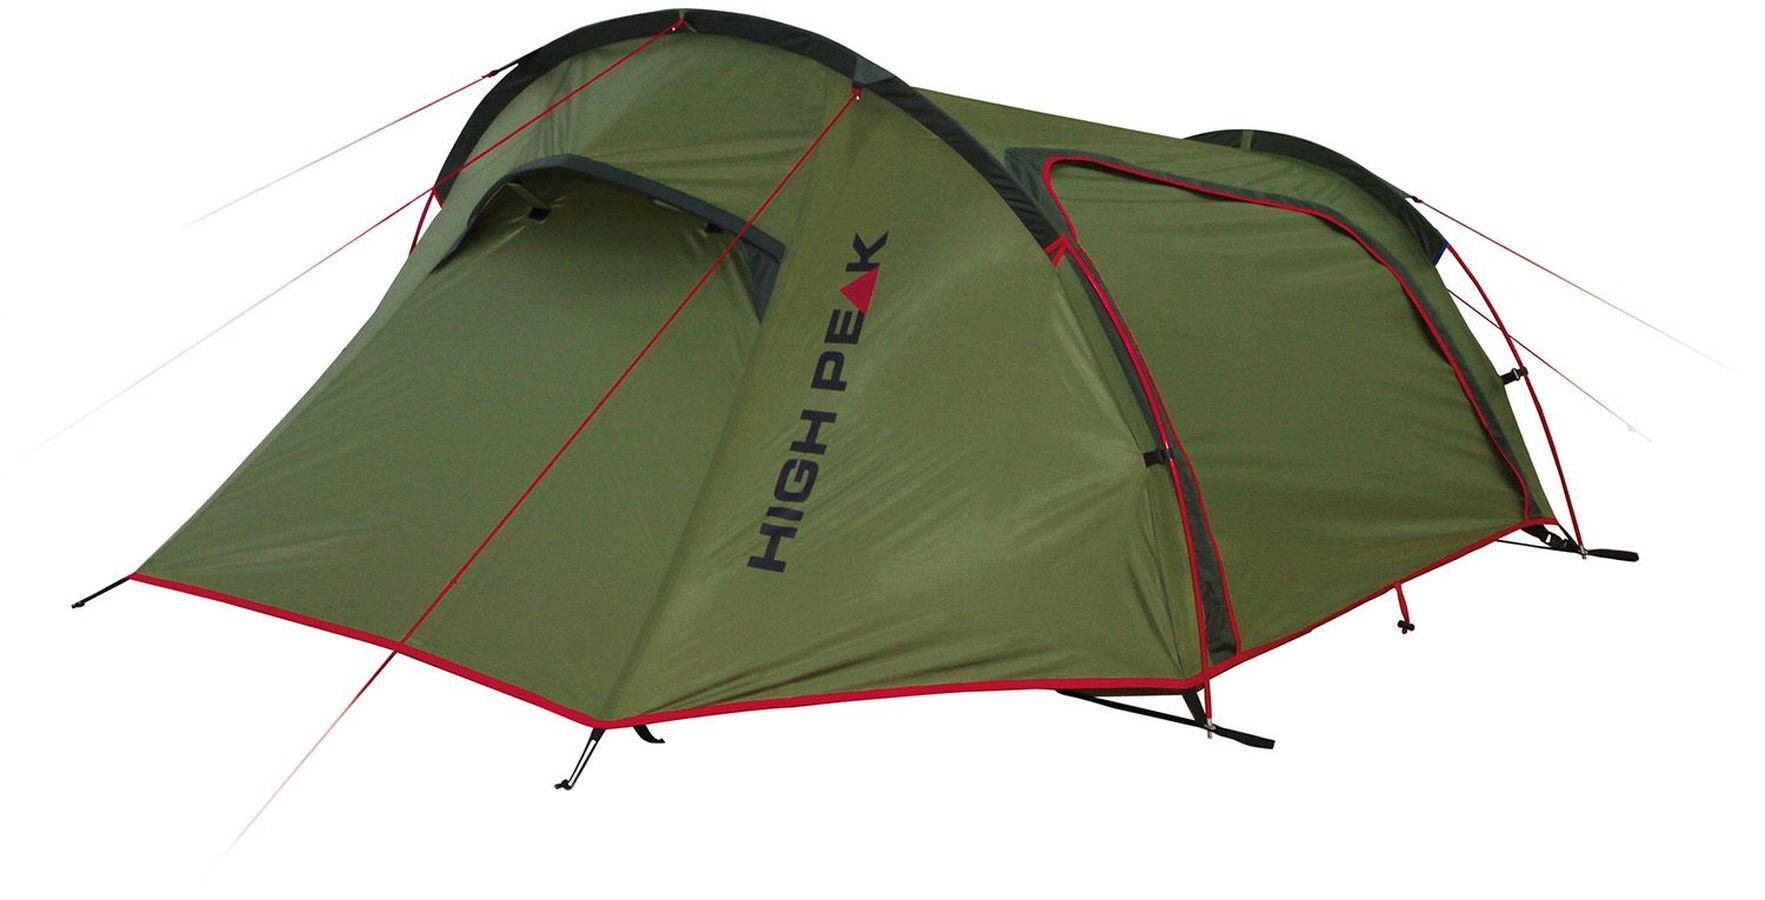 High Peak Sparrow 2 Telt, olive/red (2019)   Misc. Transportation and Storage